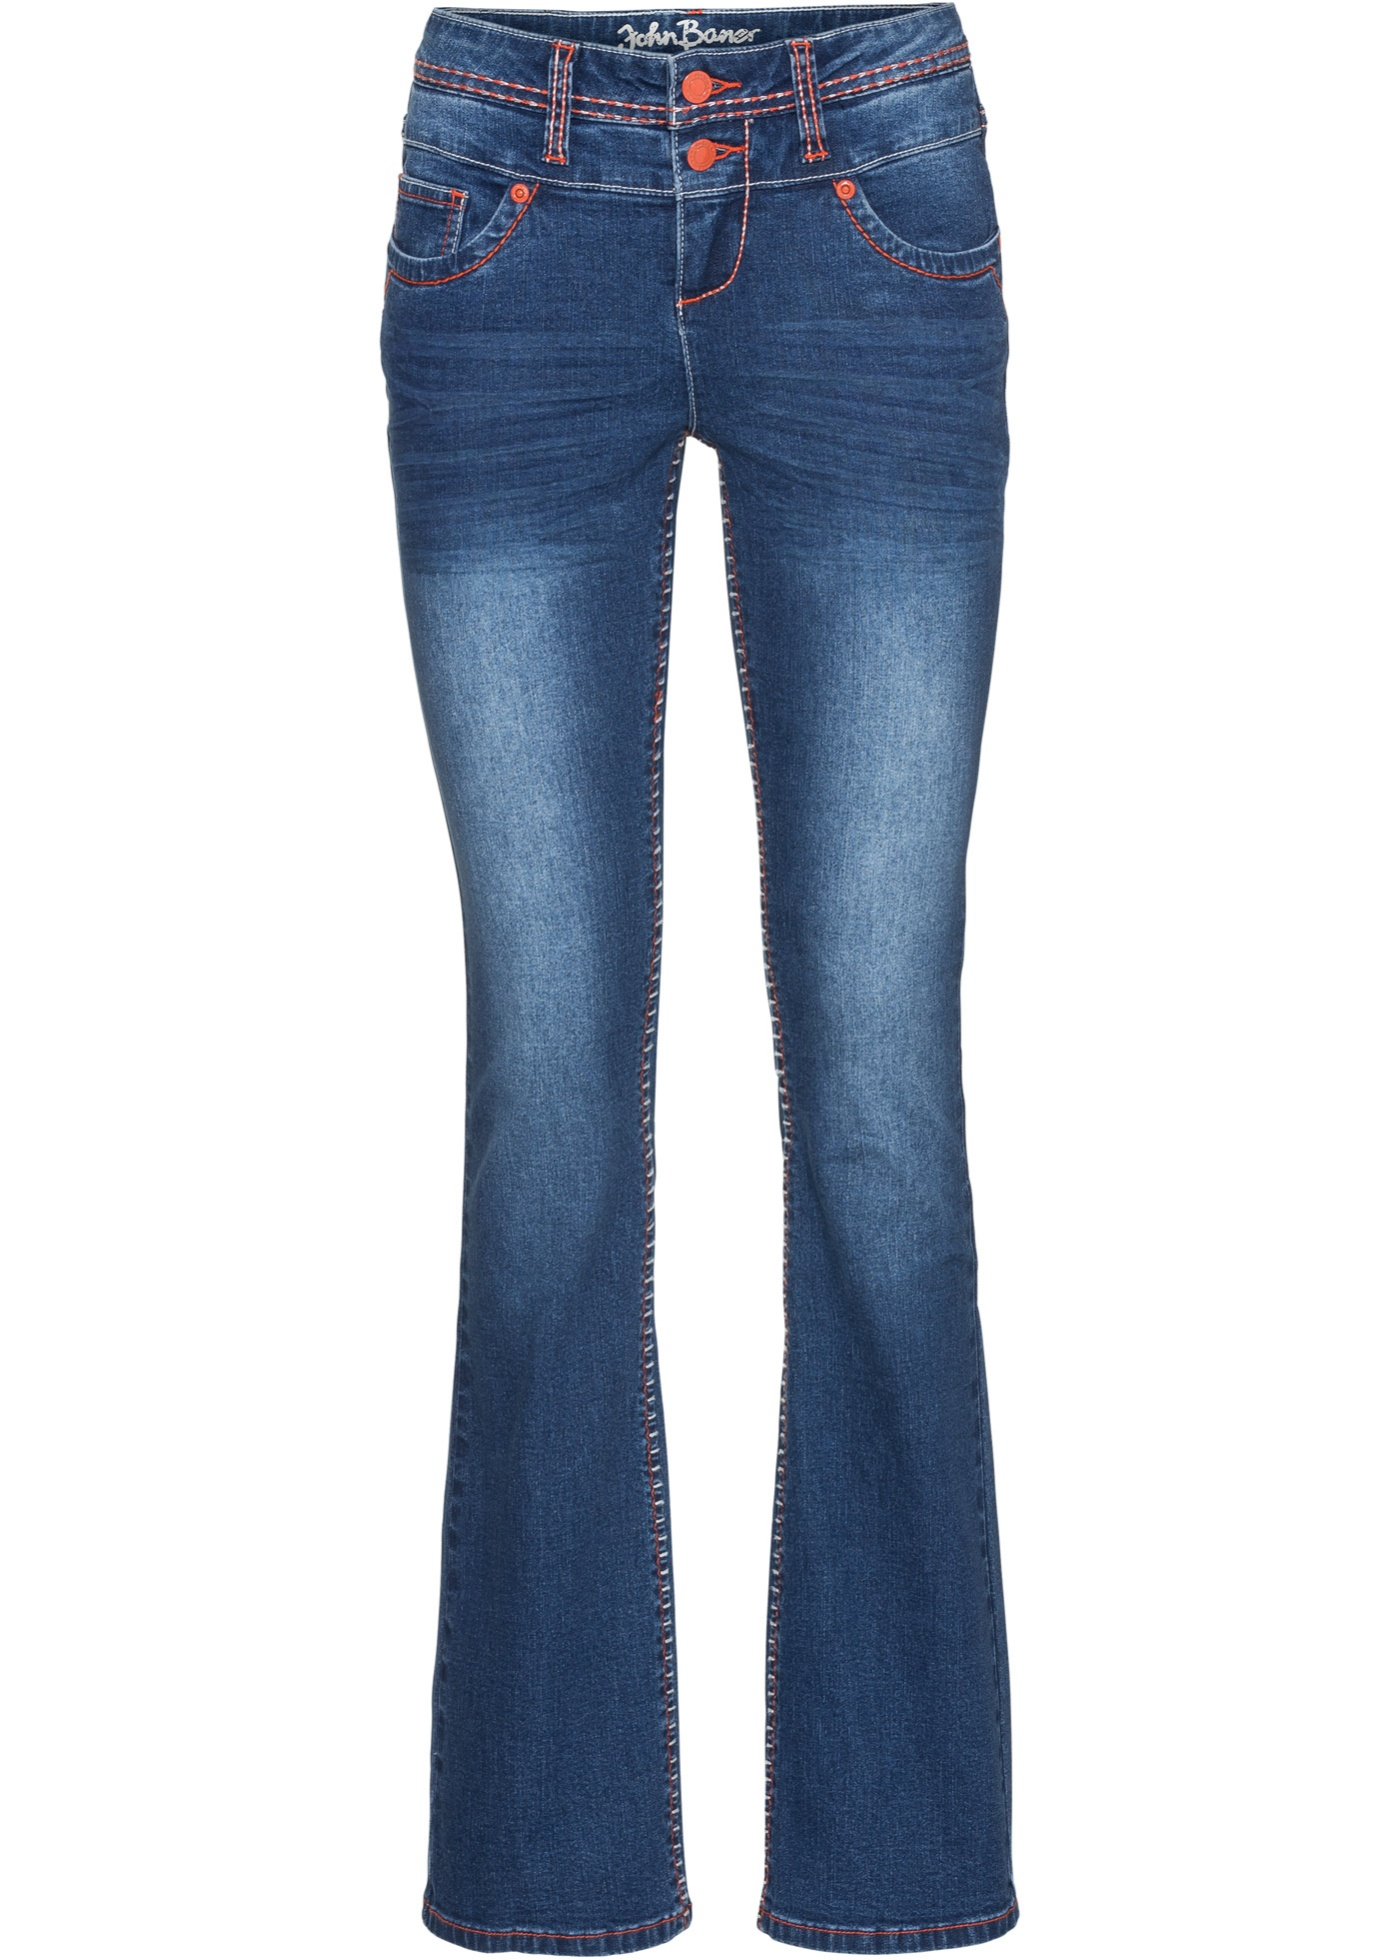 Bonprix SE - Mjuka jeans, BOOTCUT 399.00